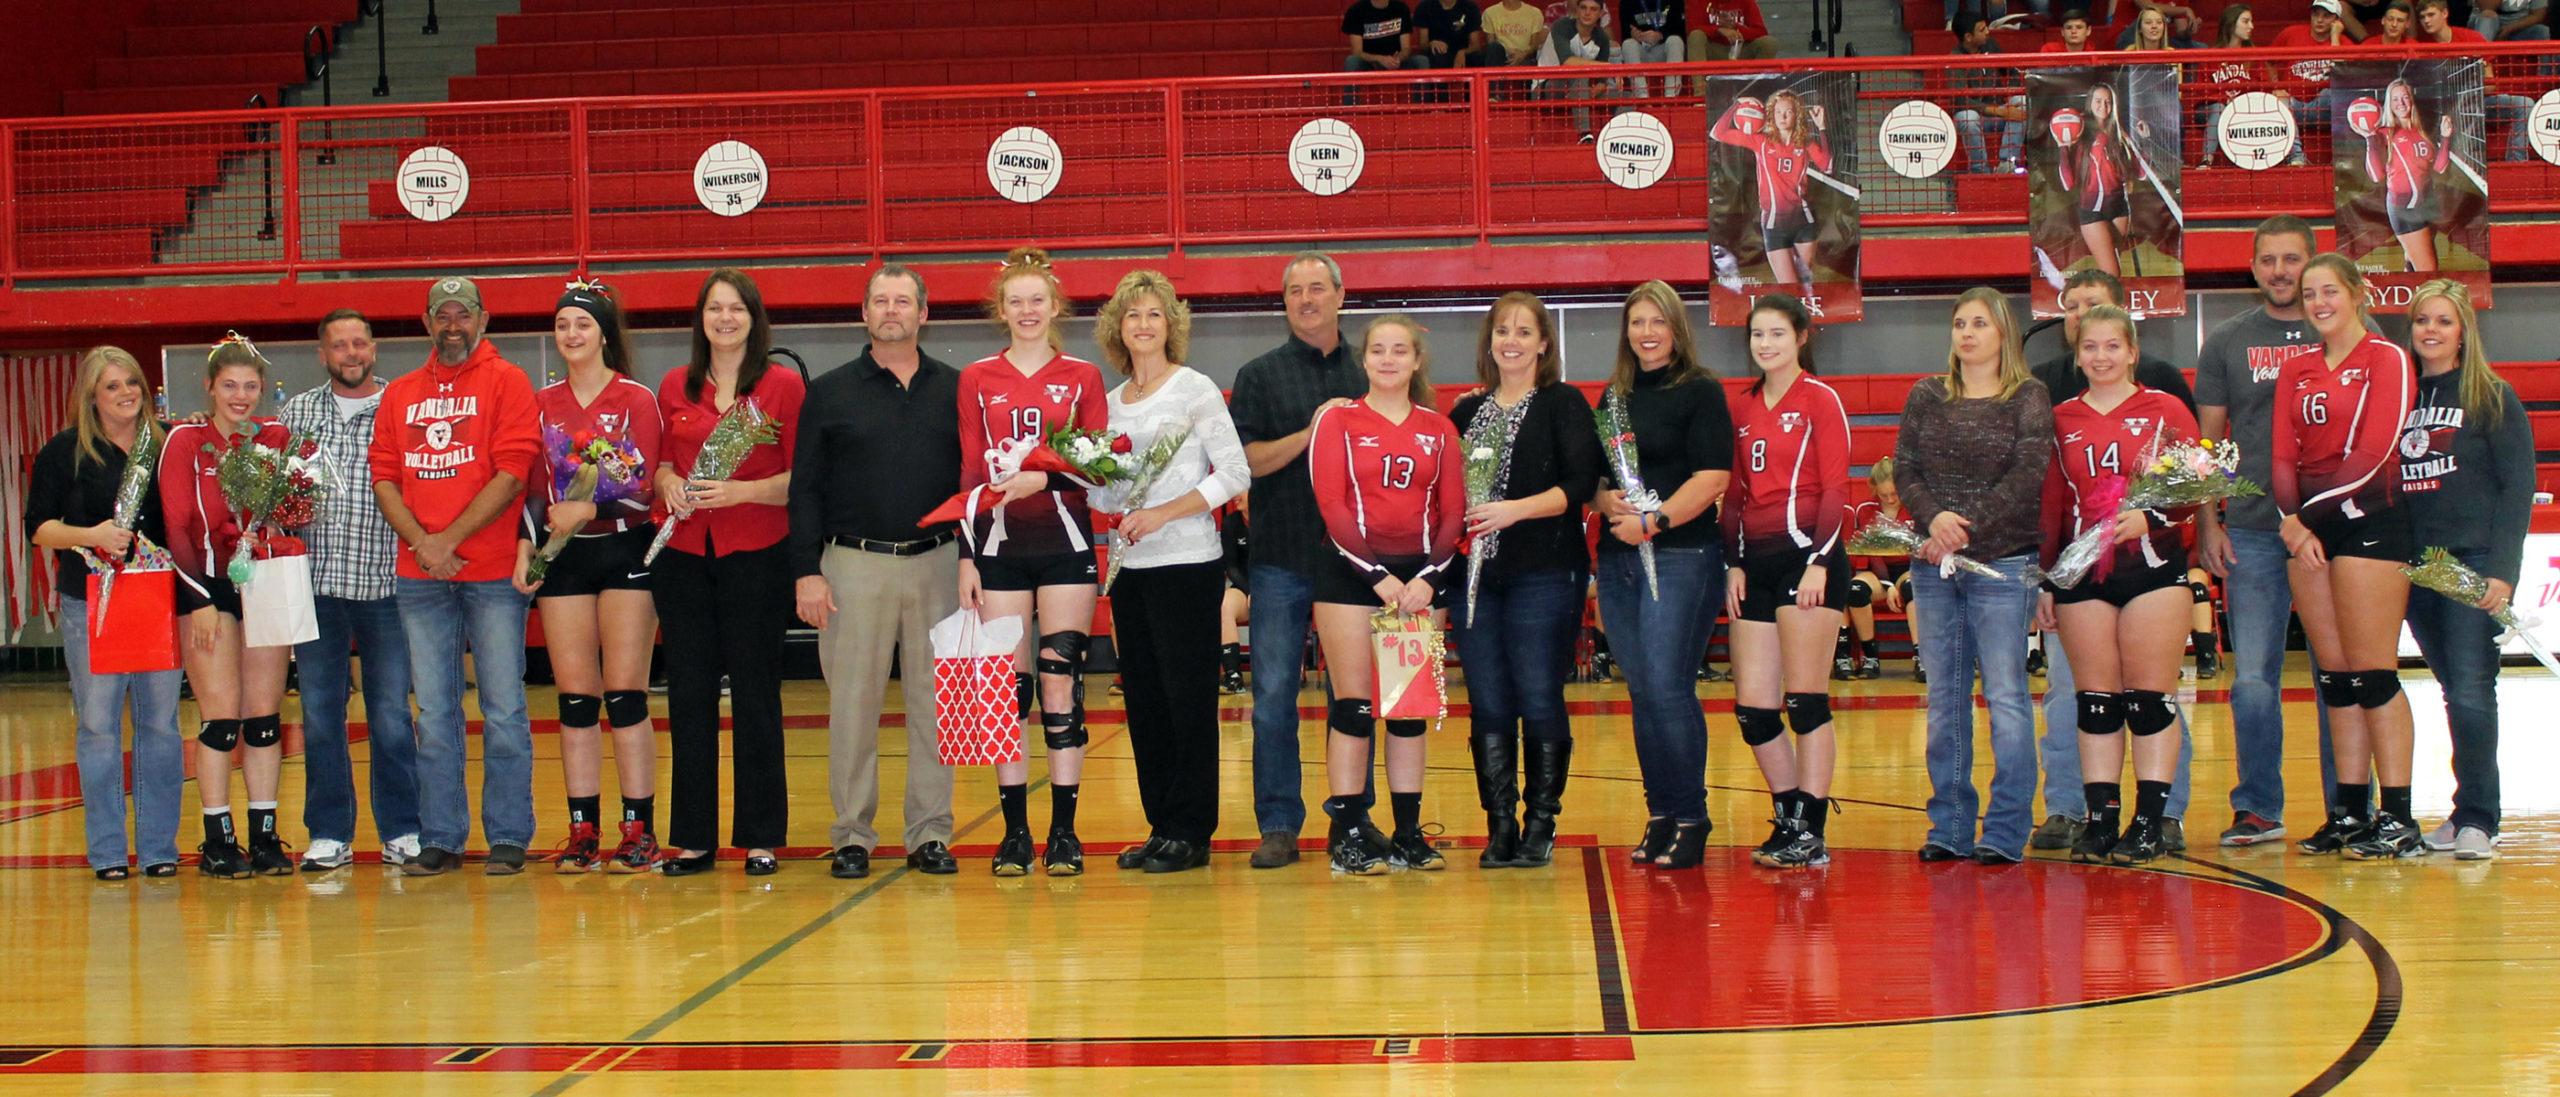 Lady Vandals Volleyball Wins On Senior Night